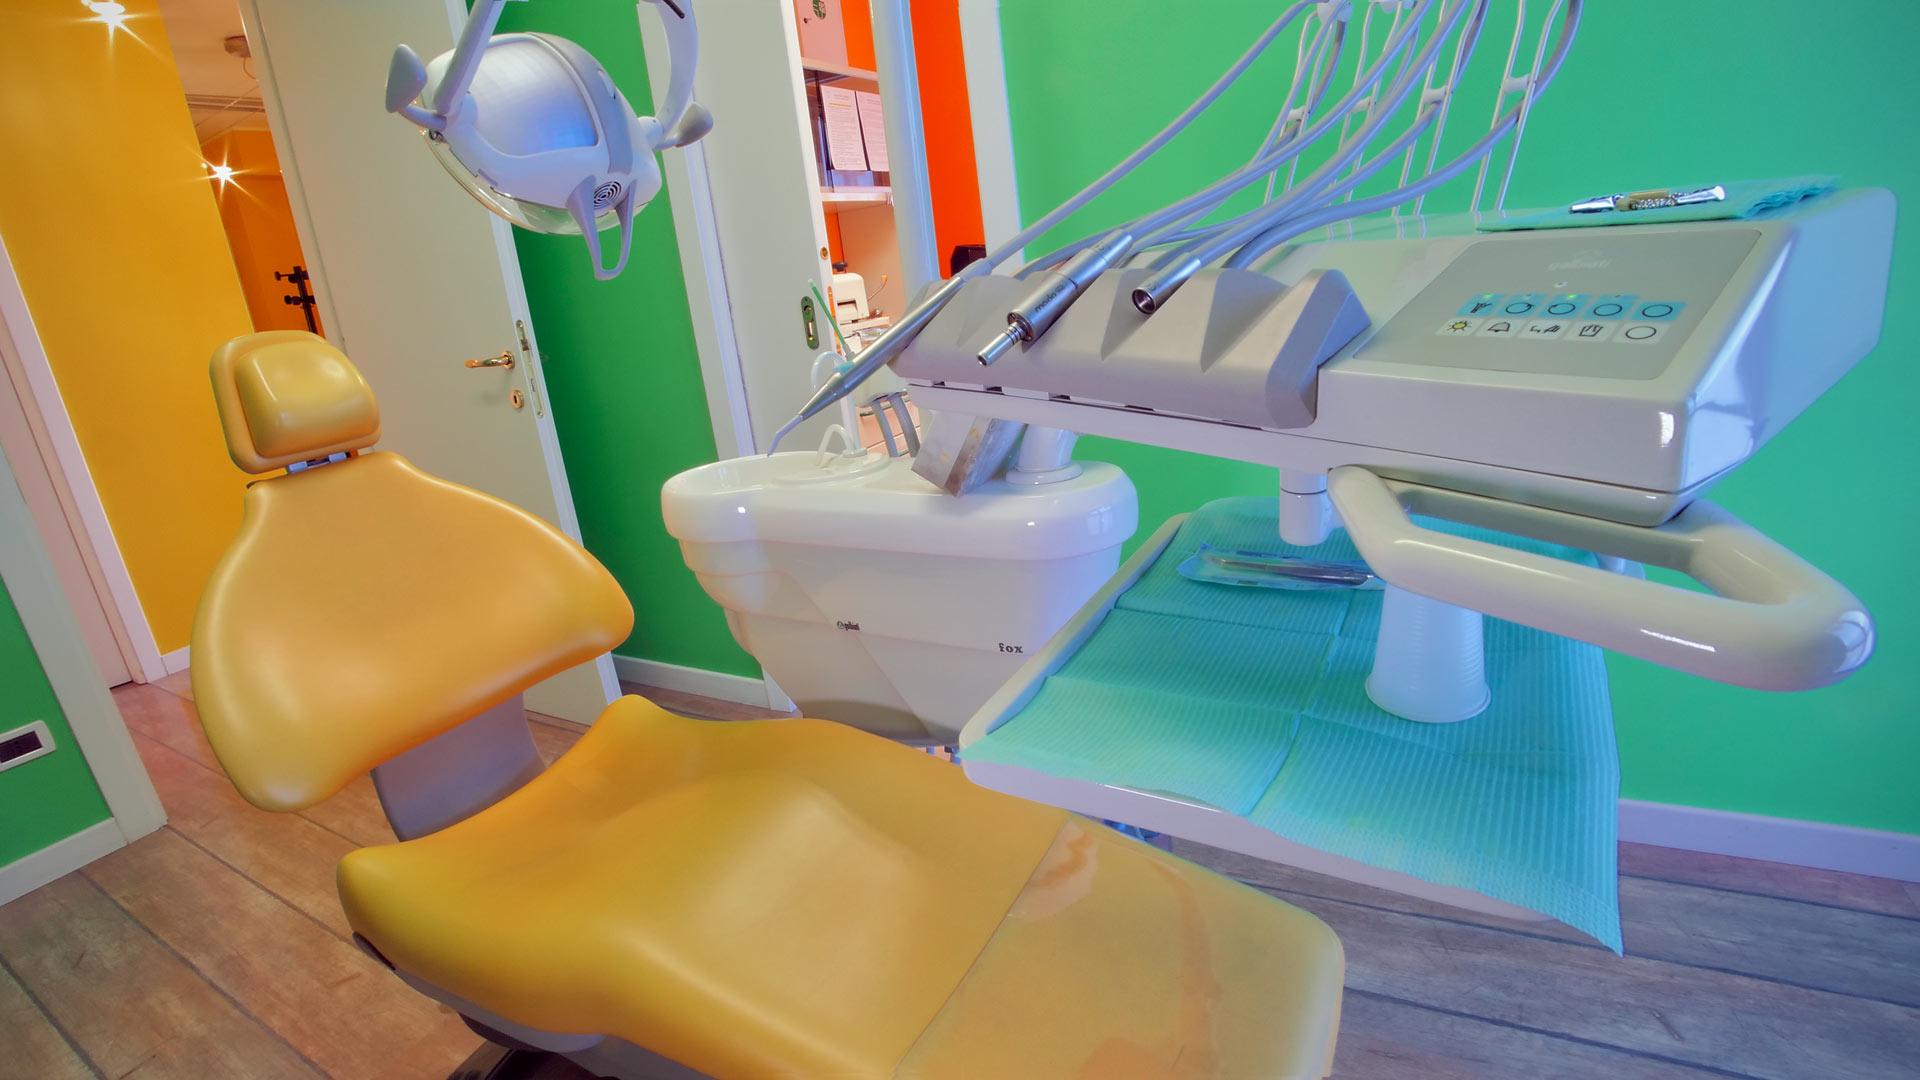 Studio di Rovetta – Sala odontoiatrica